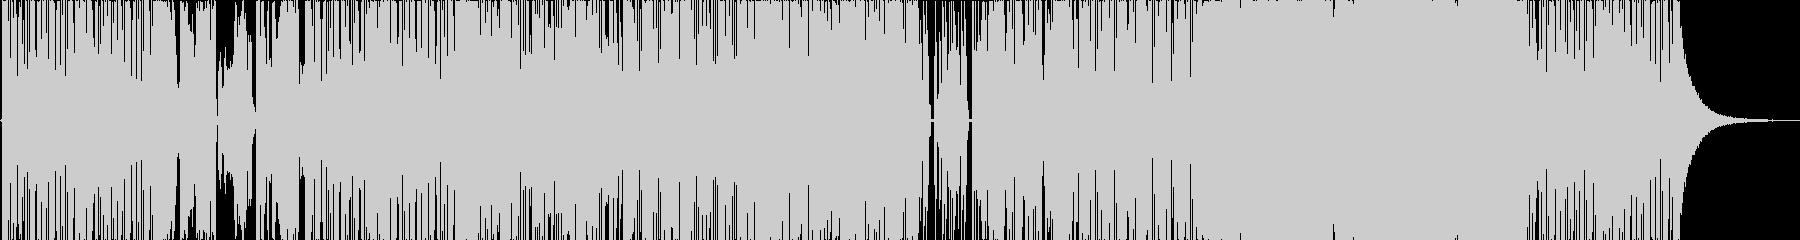 echoes of Sの未再生の波形